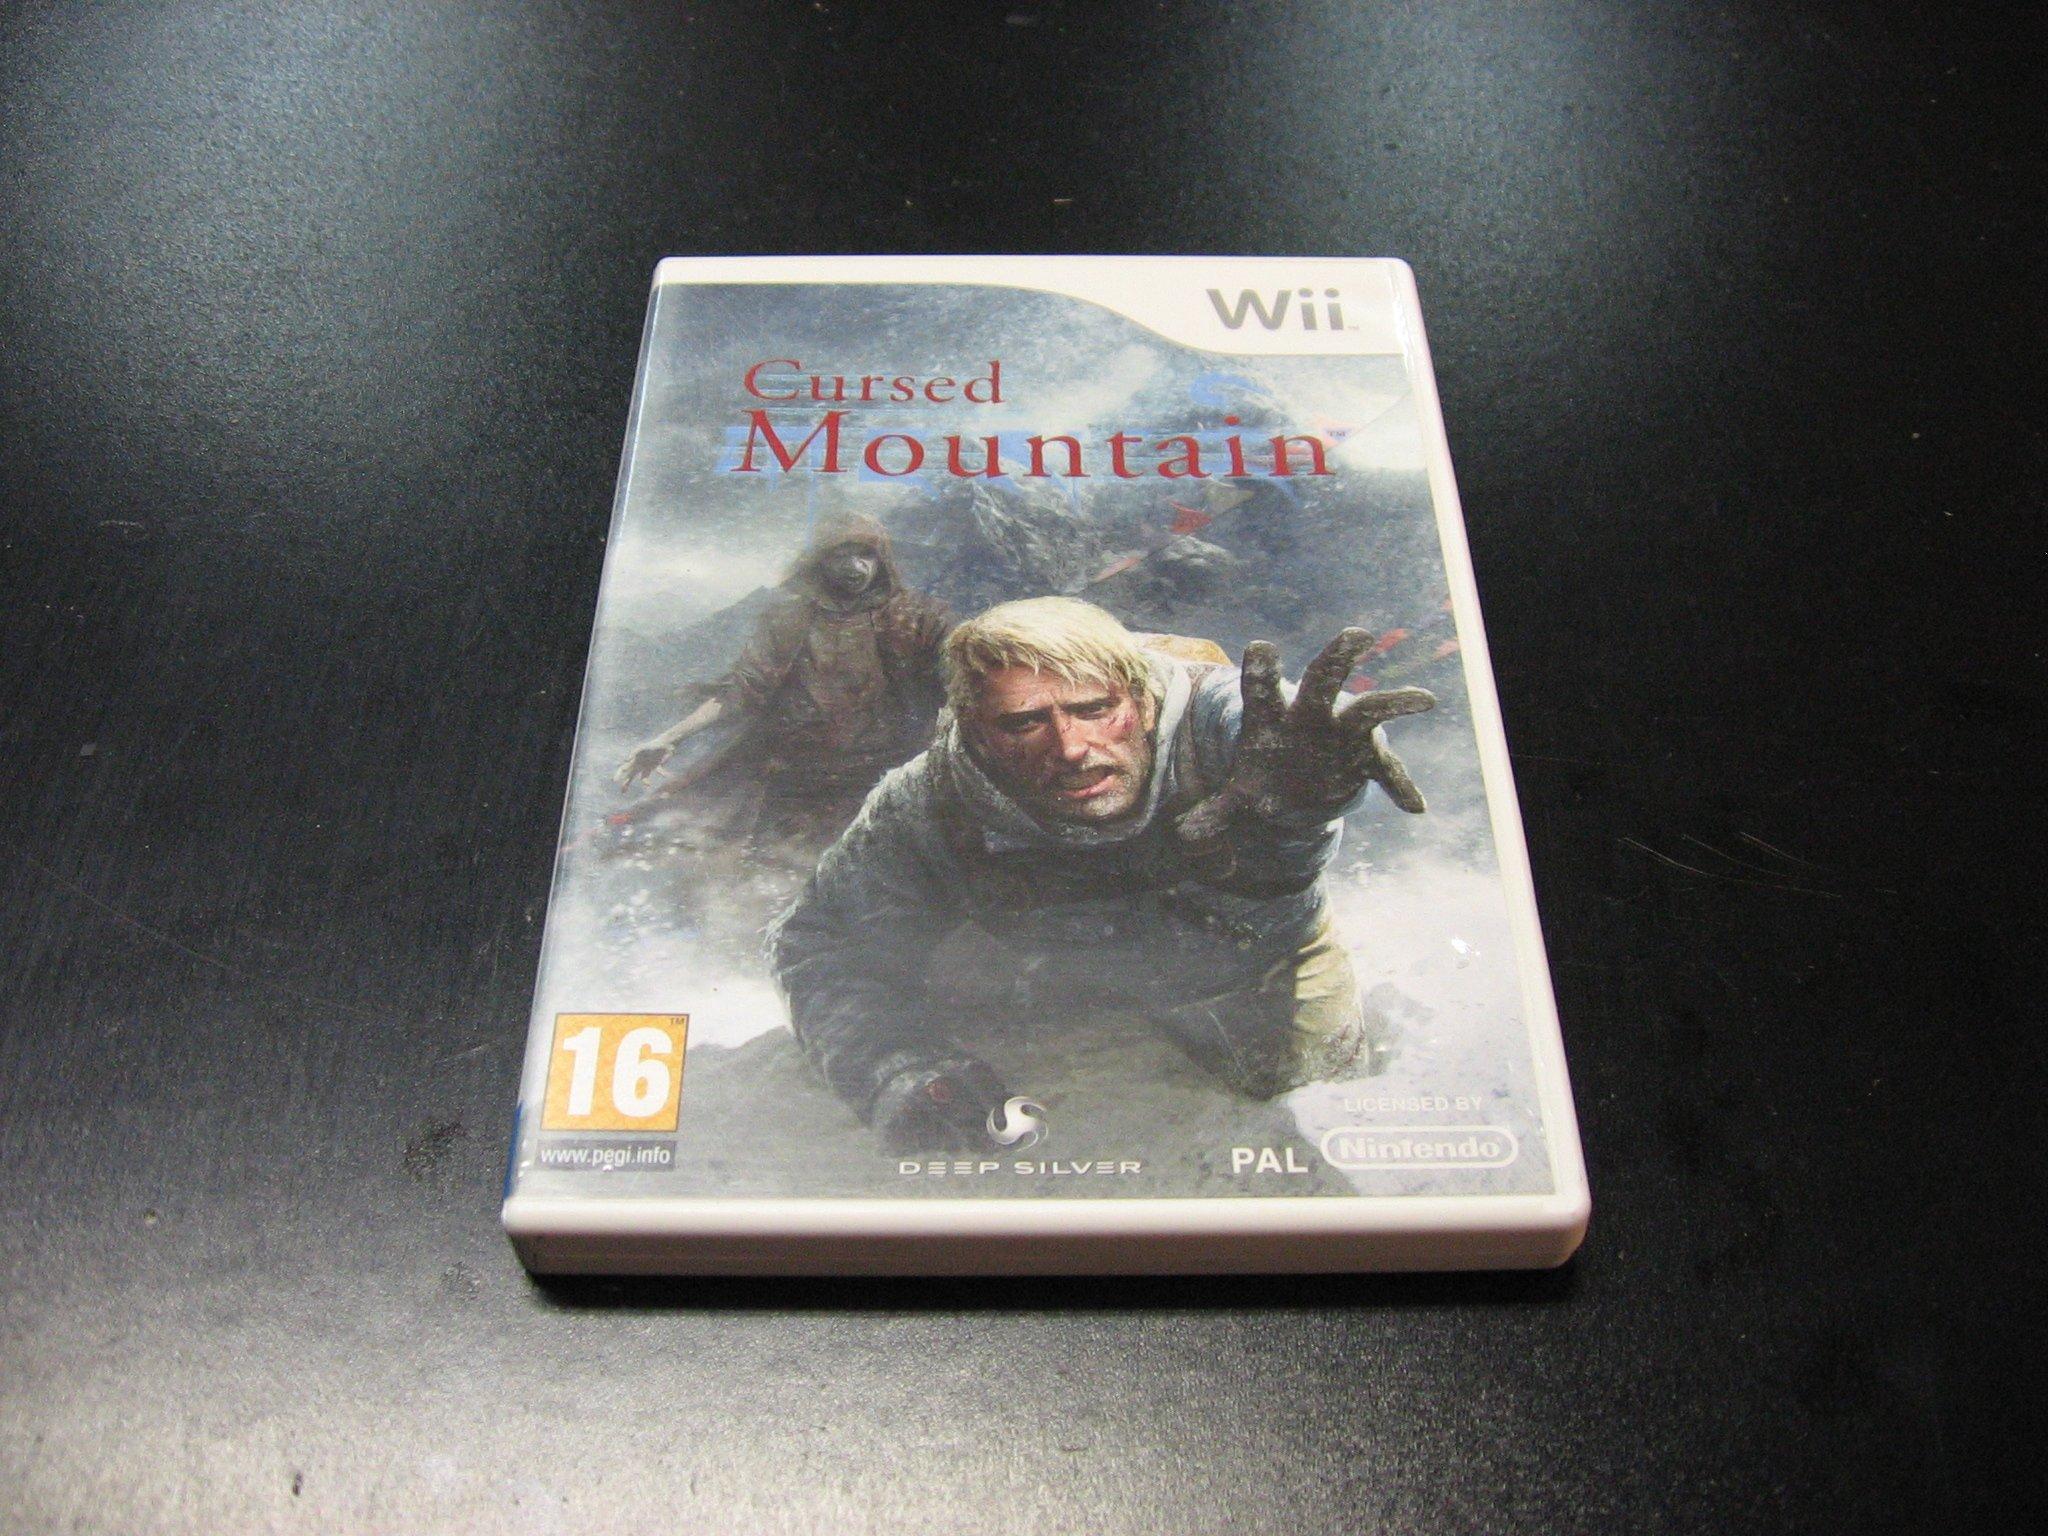 CURSED MOUNTAIN - GRA Nintendo Wii Sklep